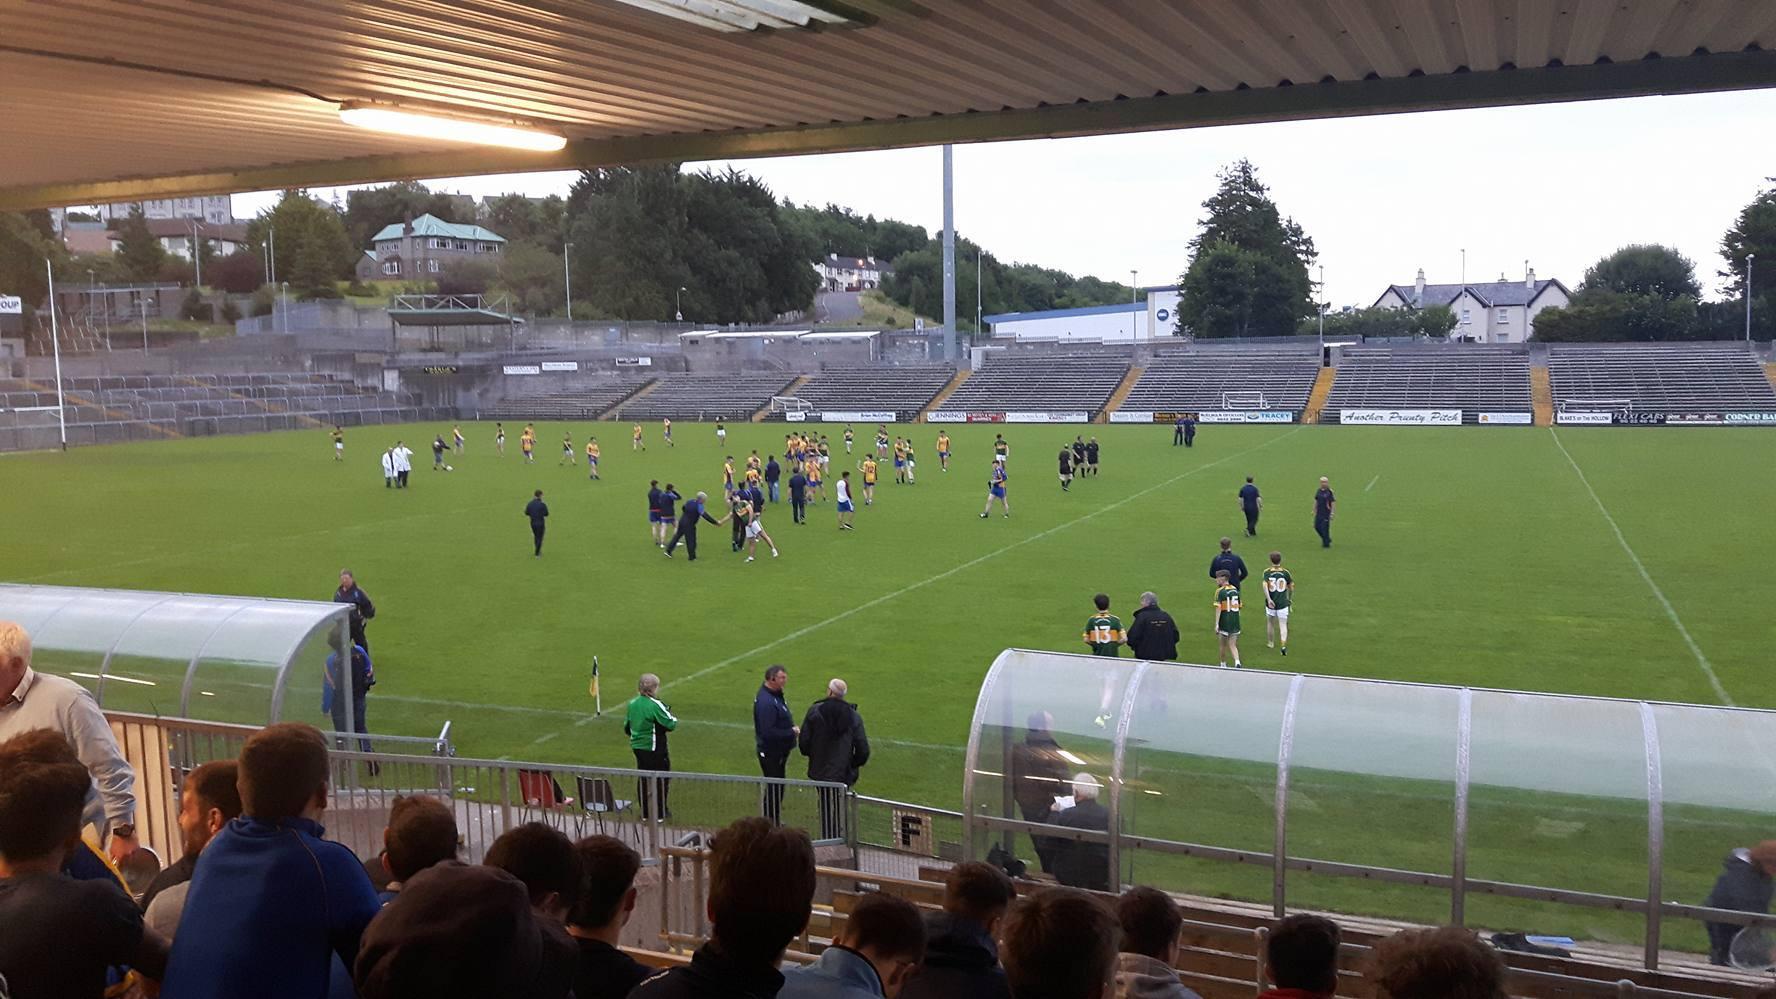 Enniskillen Minor Champions again